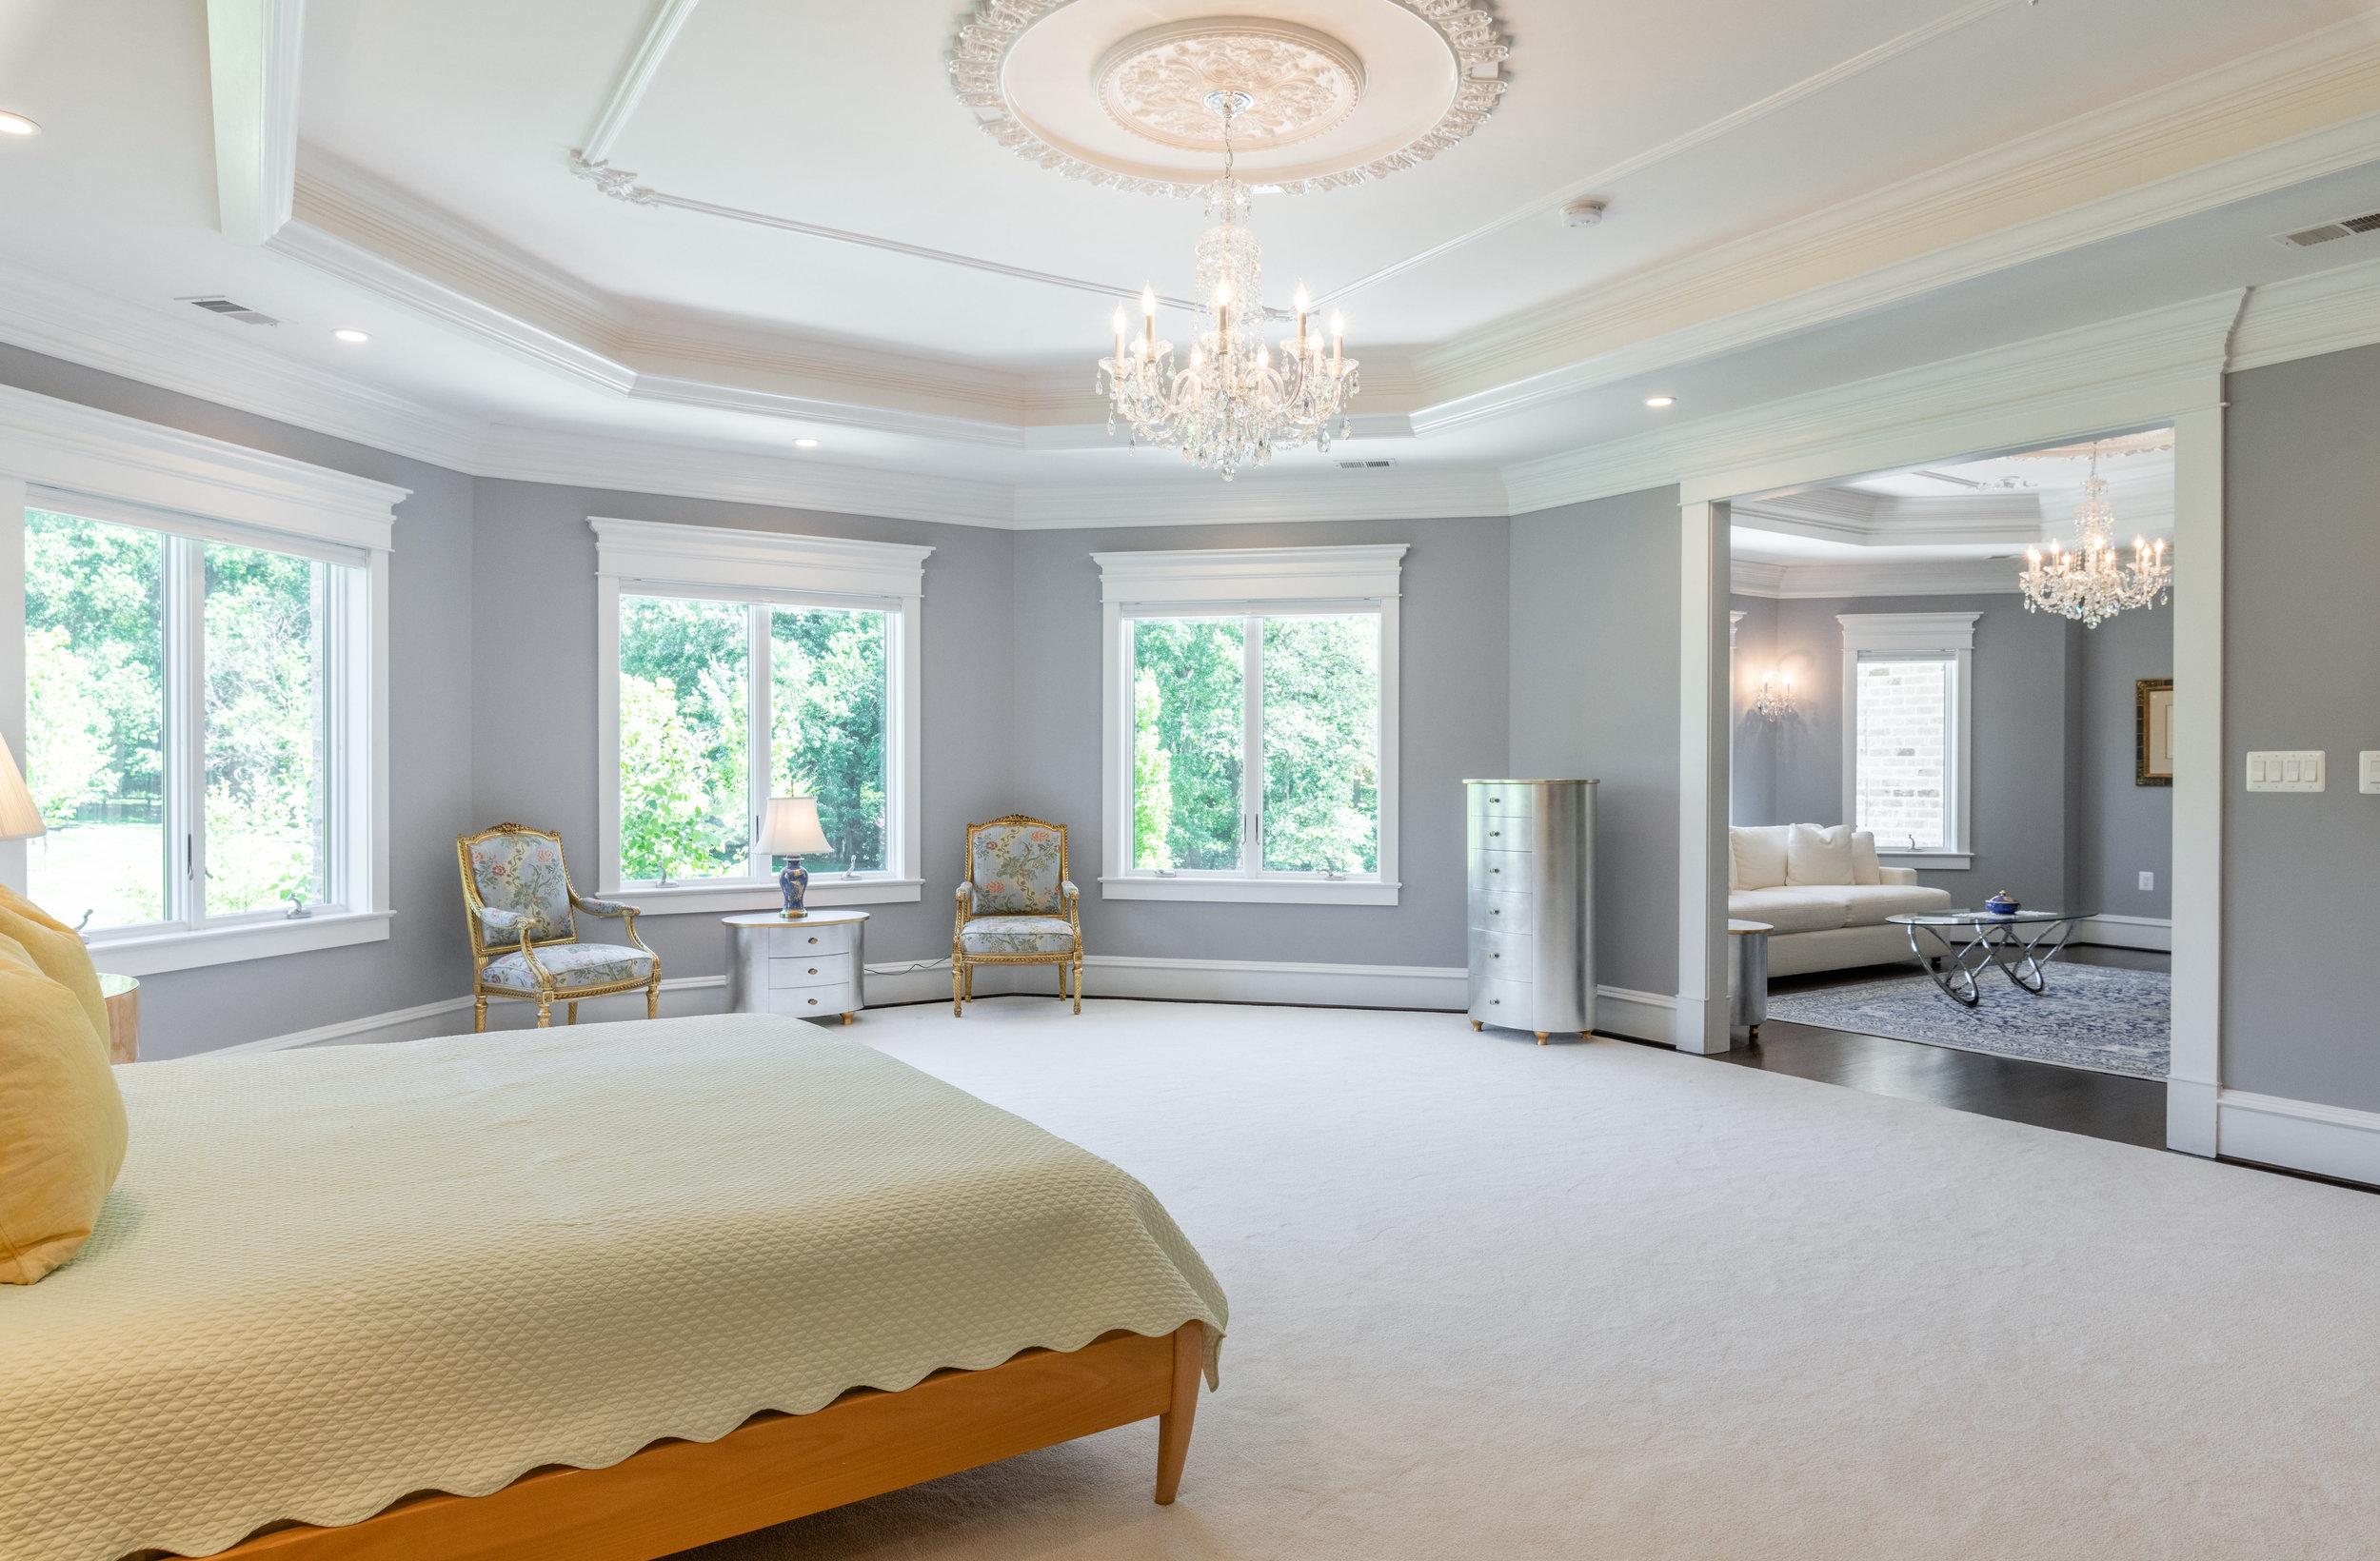 Master Bedroom adjoins private Sitting Room